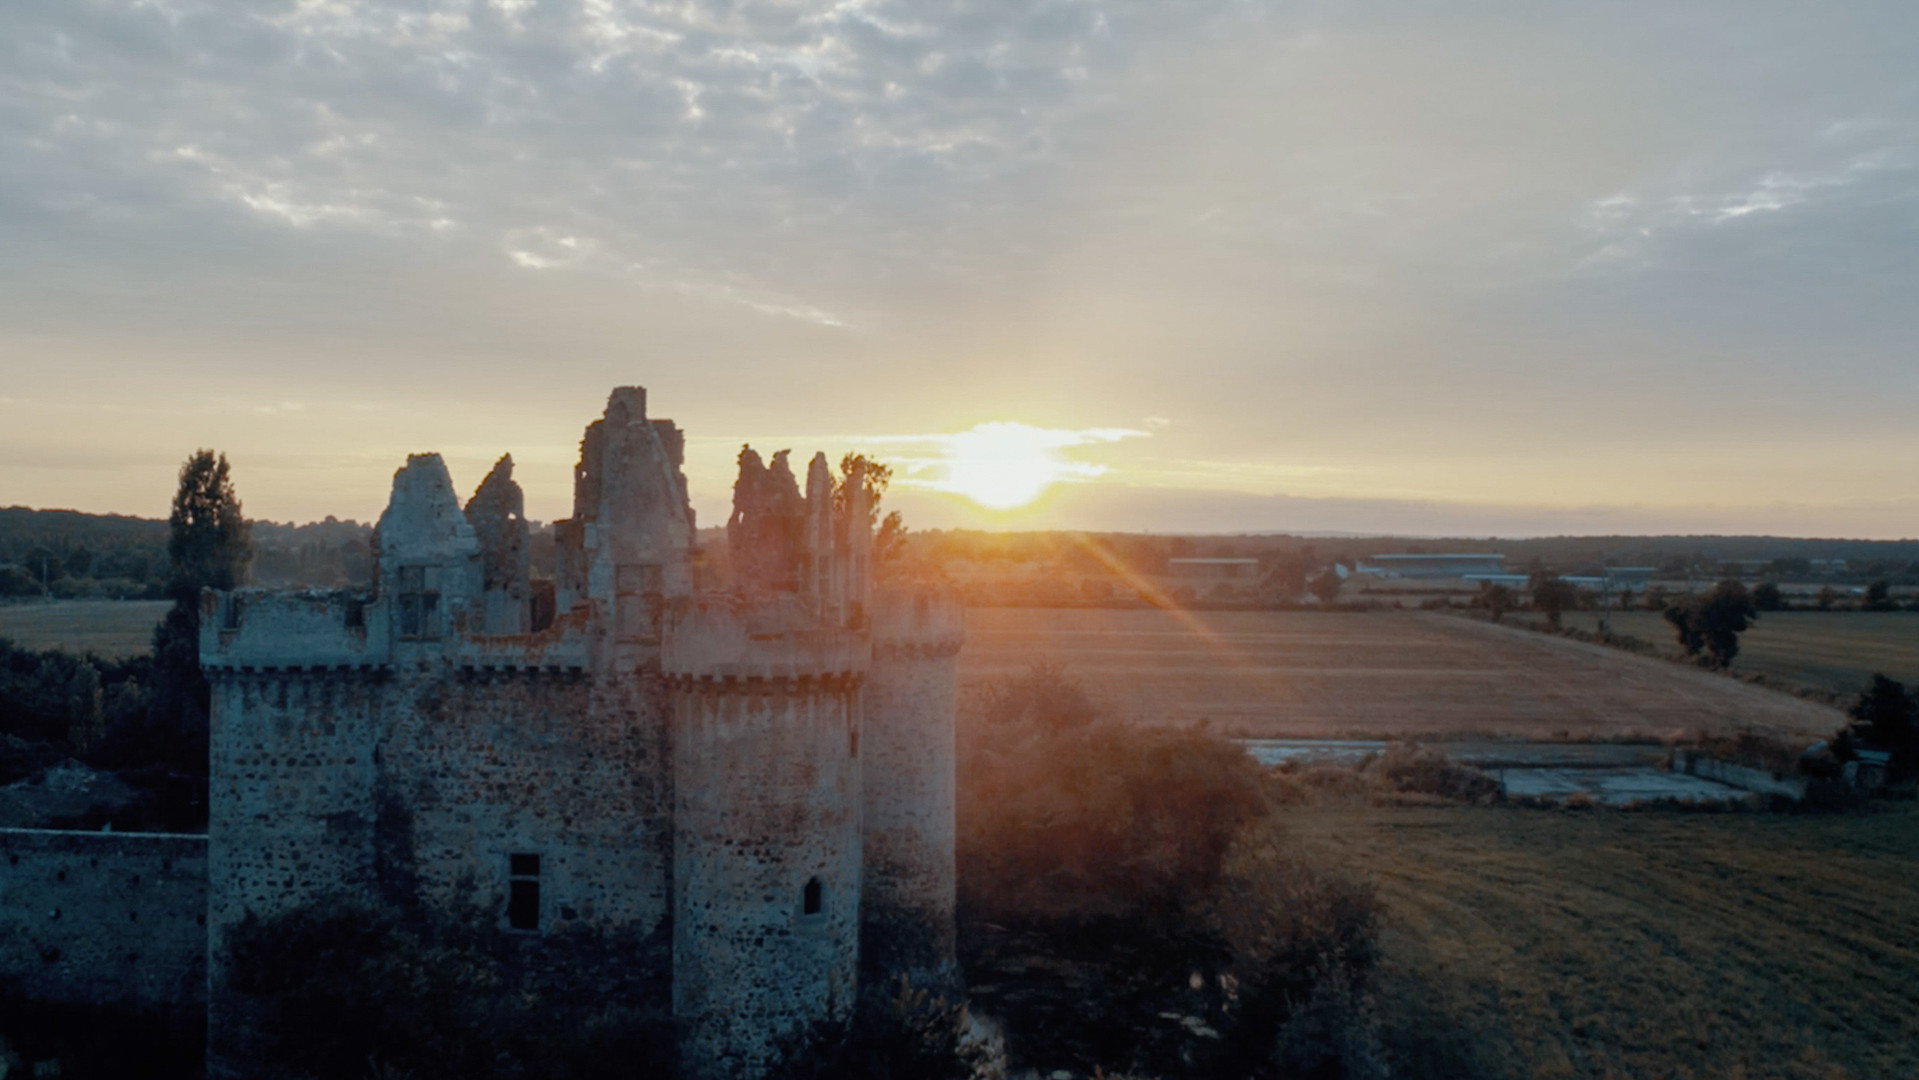 Château fort de l'Ebaupinay